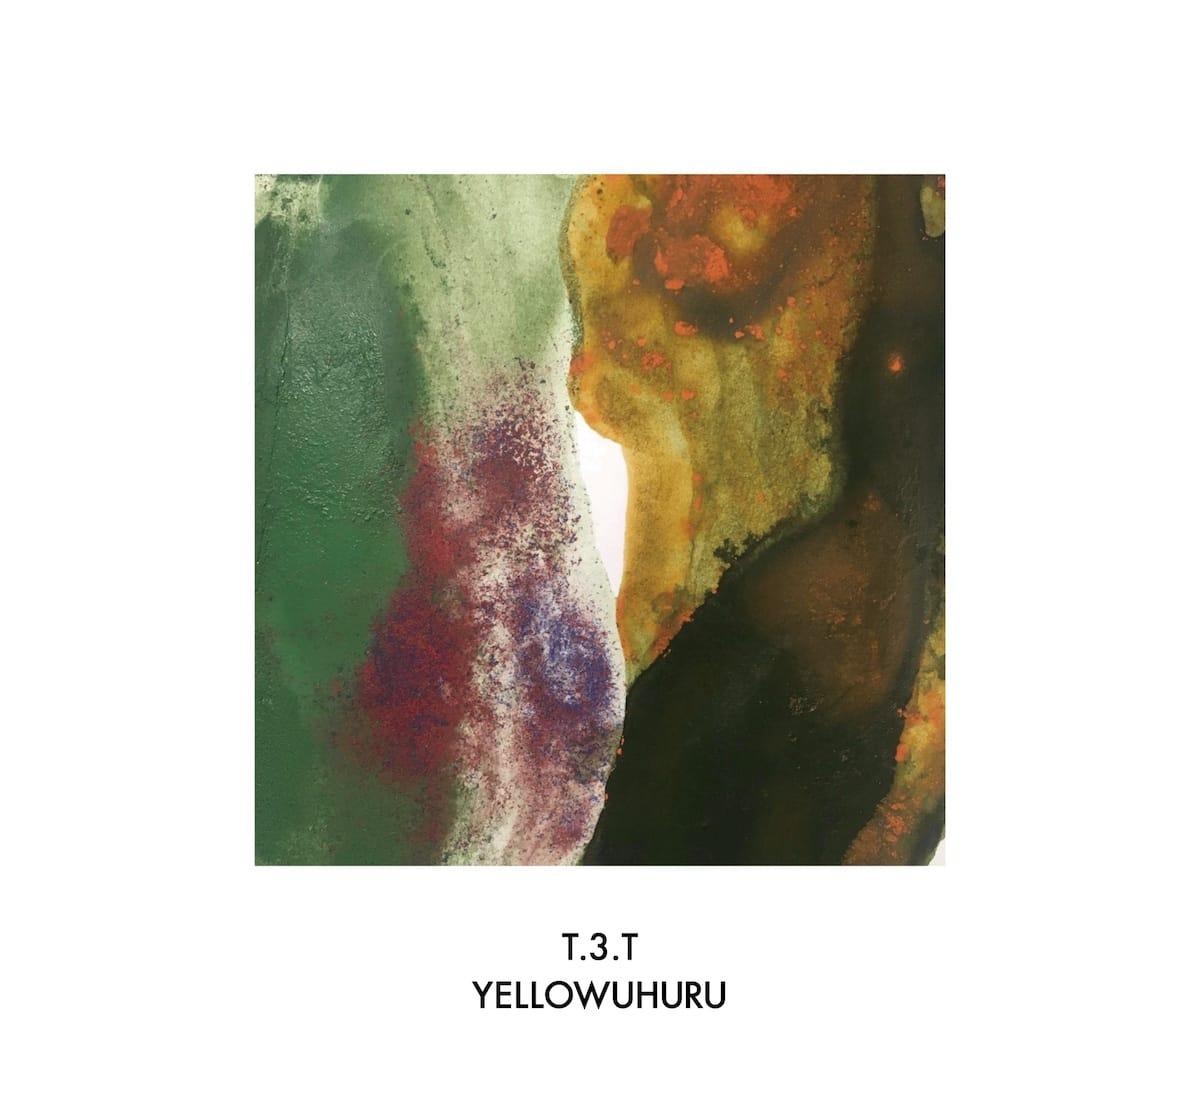 YELLOWUHURUのDJ MIX『T.3.T』がリリース。OMSBに続き〈GHPD〉第2弾のドロップ music180522-yellowuhuru-1-1200x1117